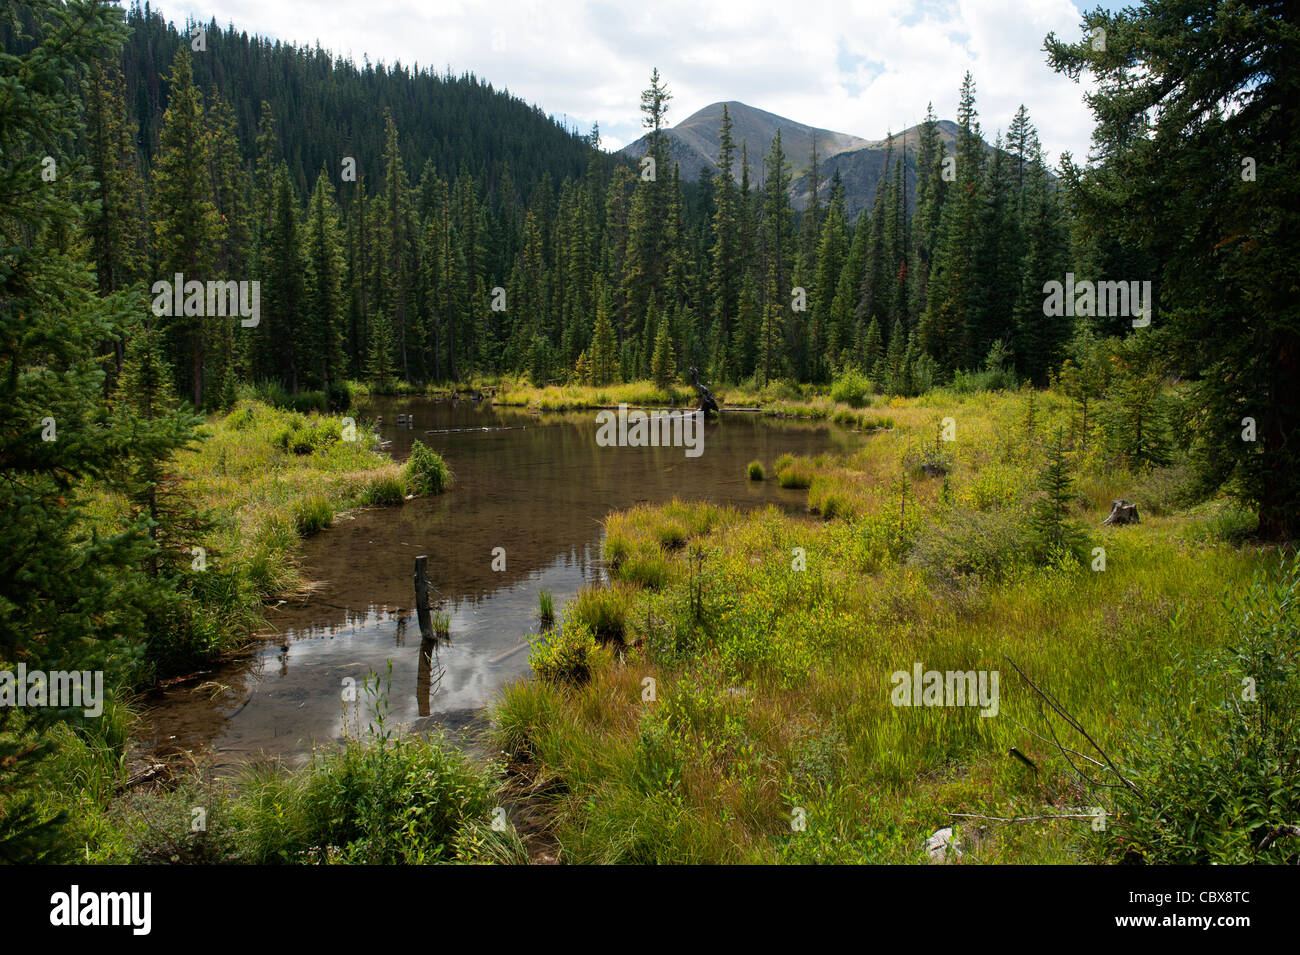 Beaver pond in Cottonwood Creek, Chaffee County, Colorado - Stock Image